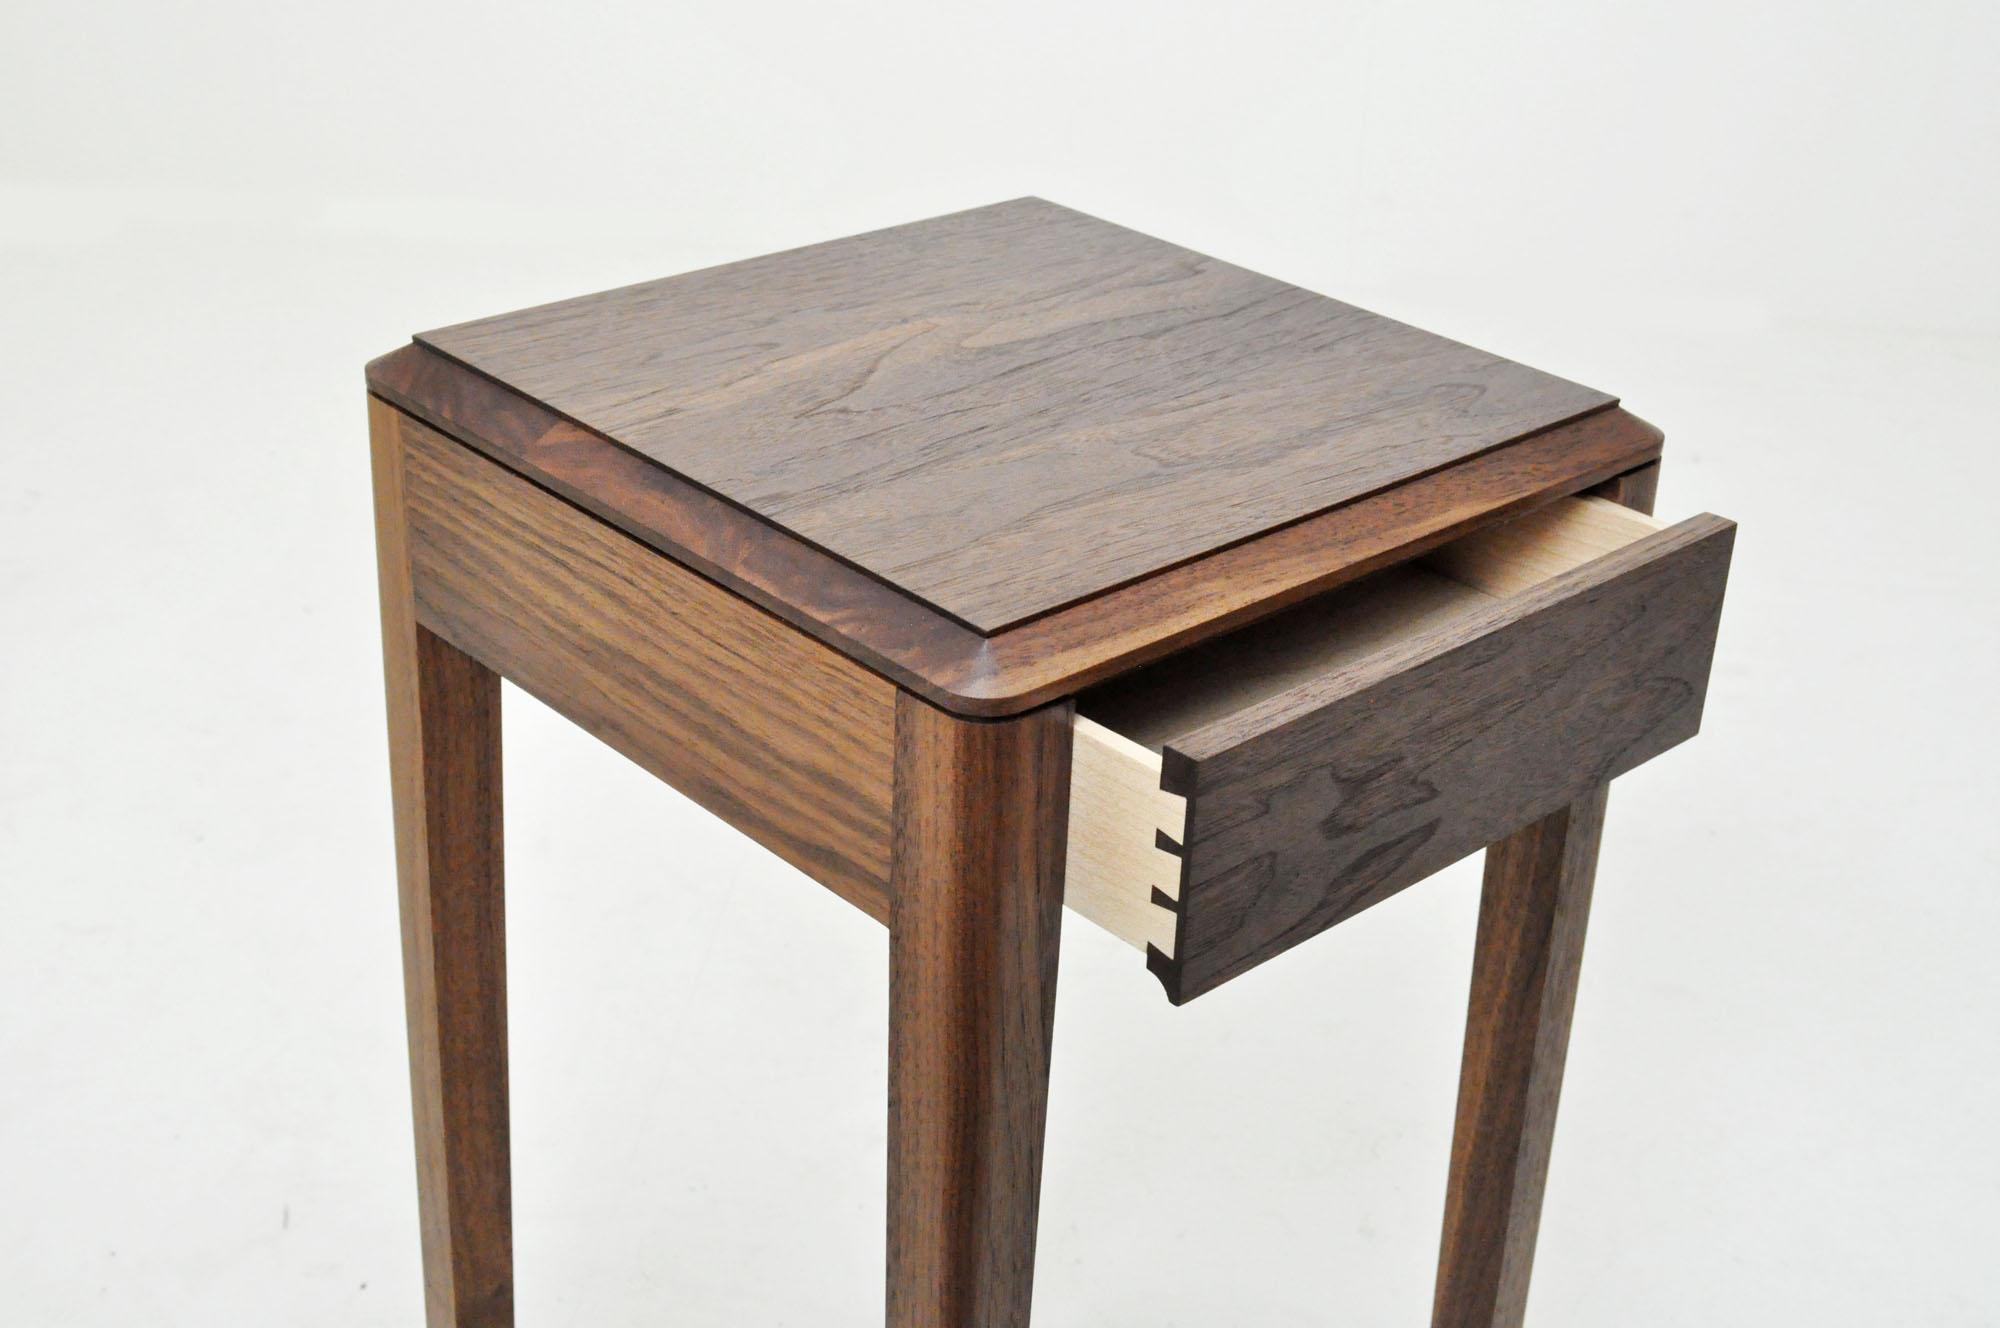 walnut table open drawer edit smaller.jpg